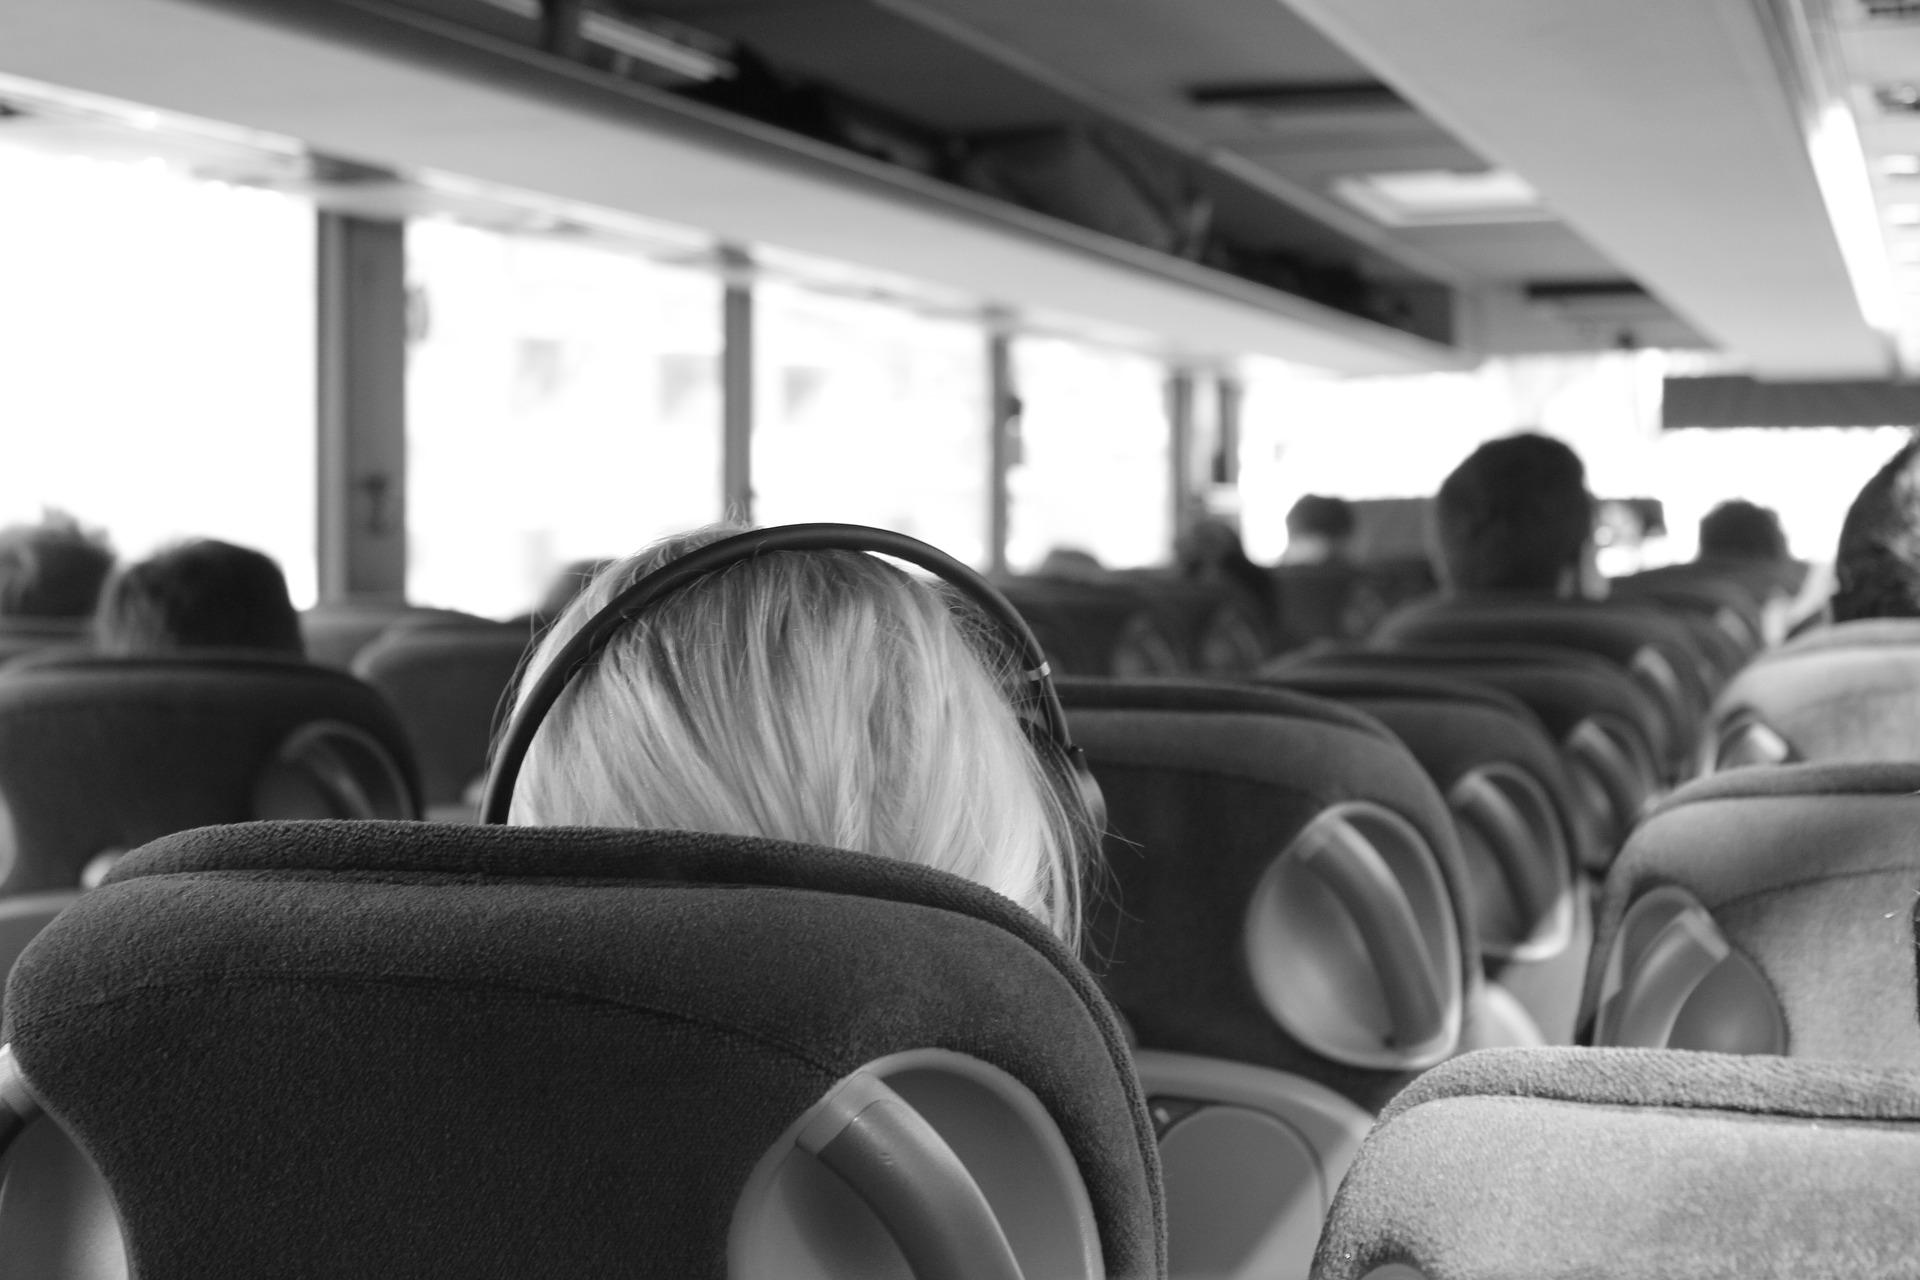 ventajas de viajar en autobús